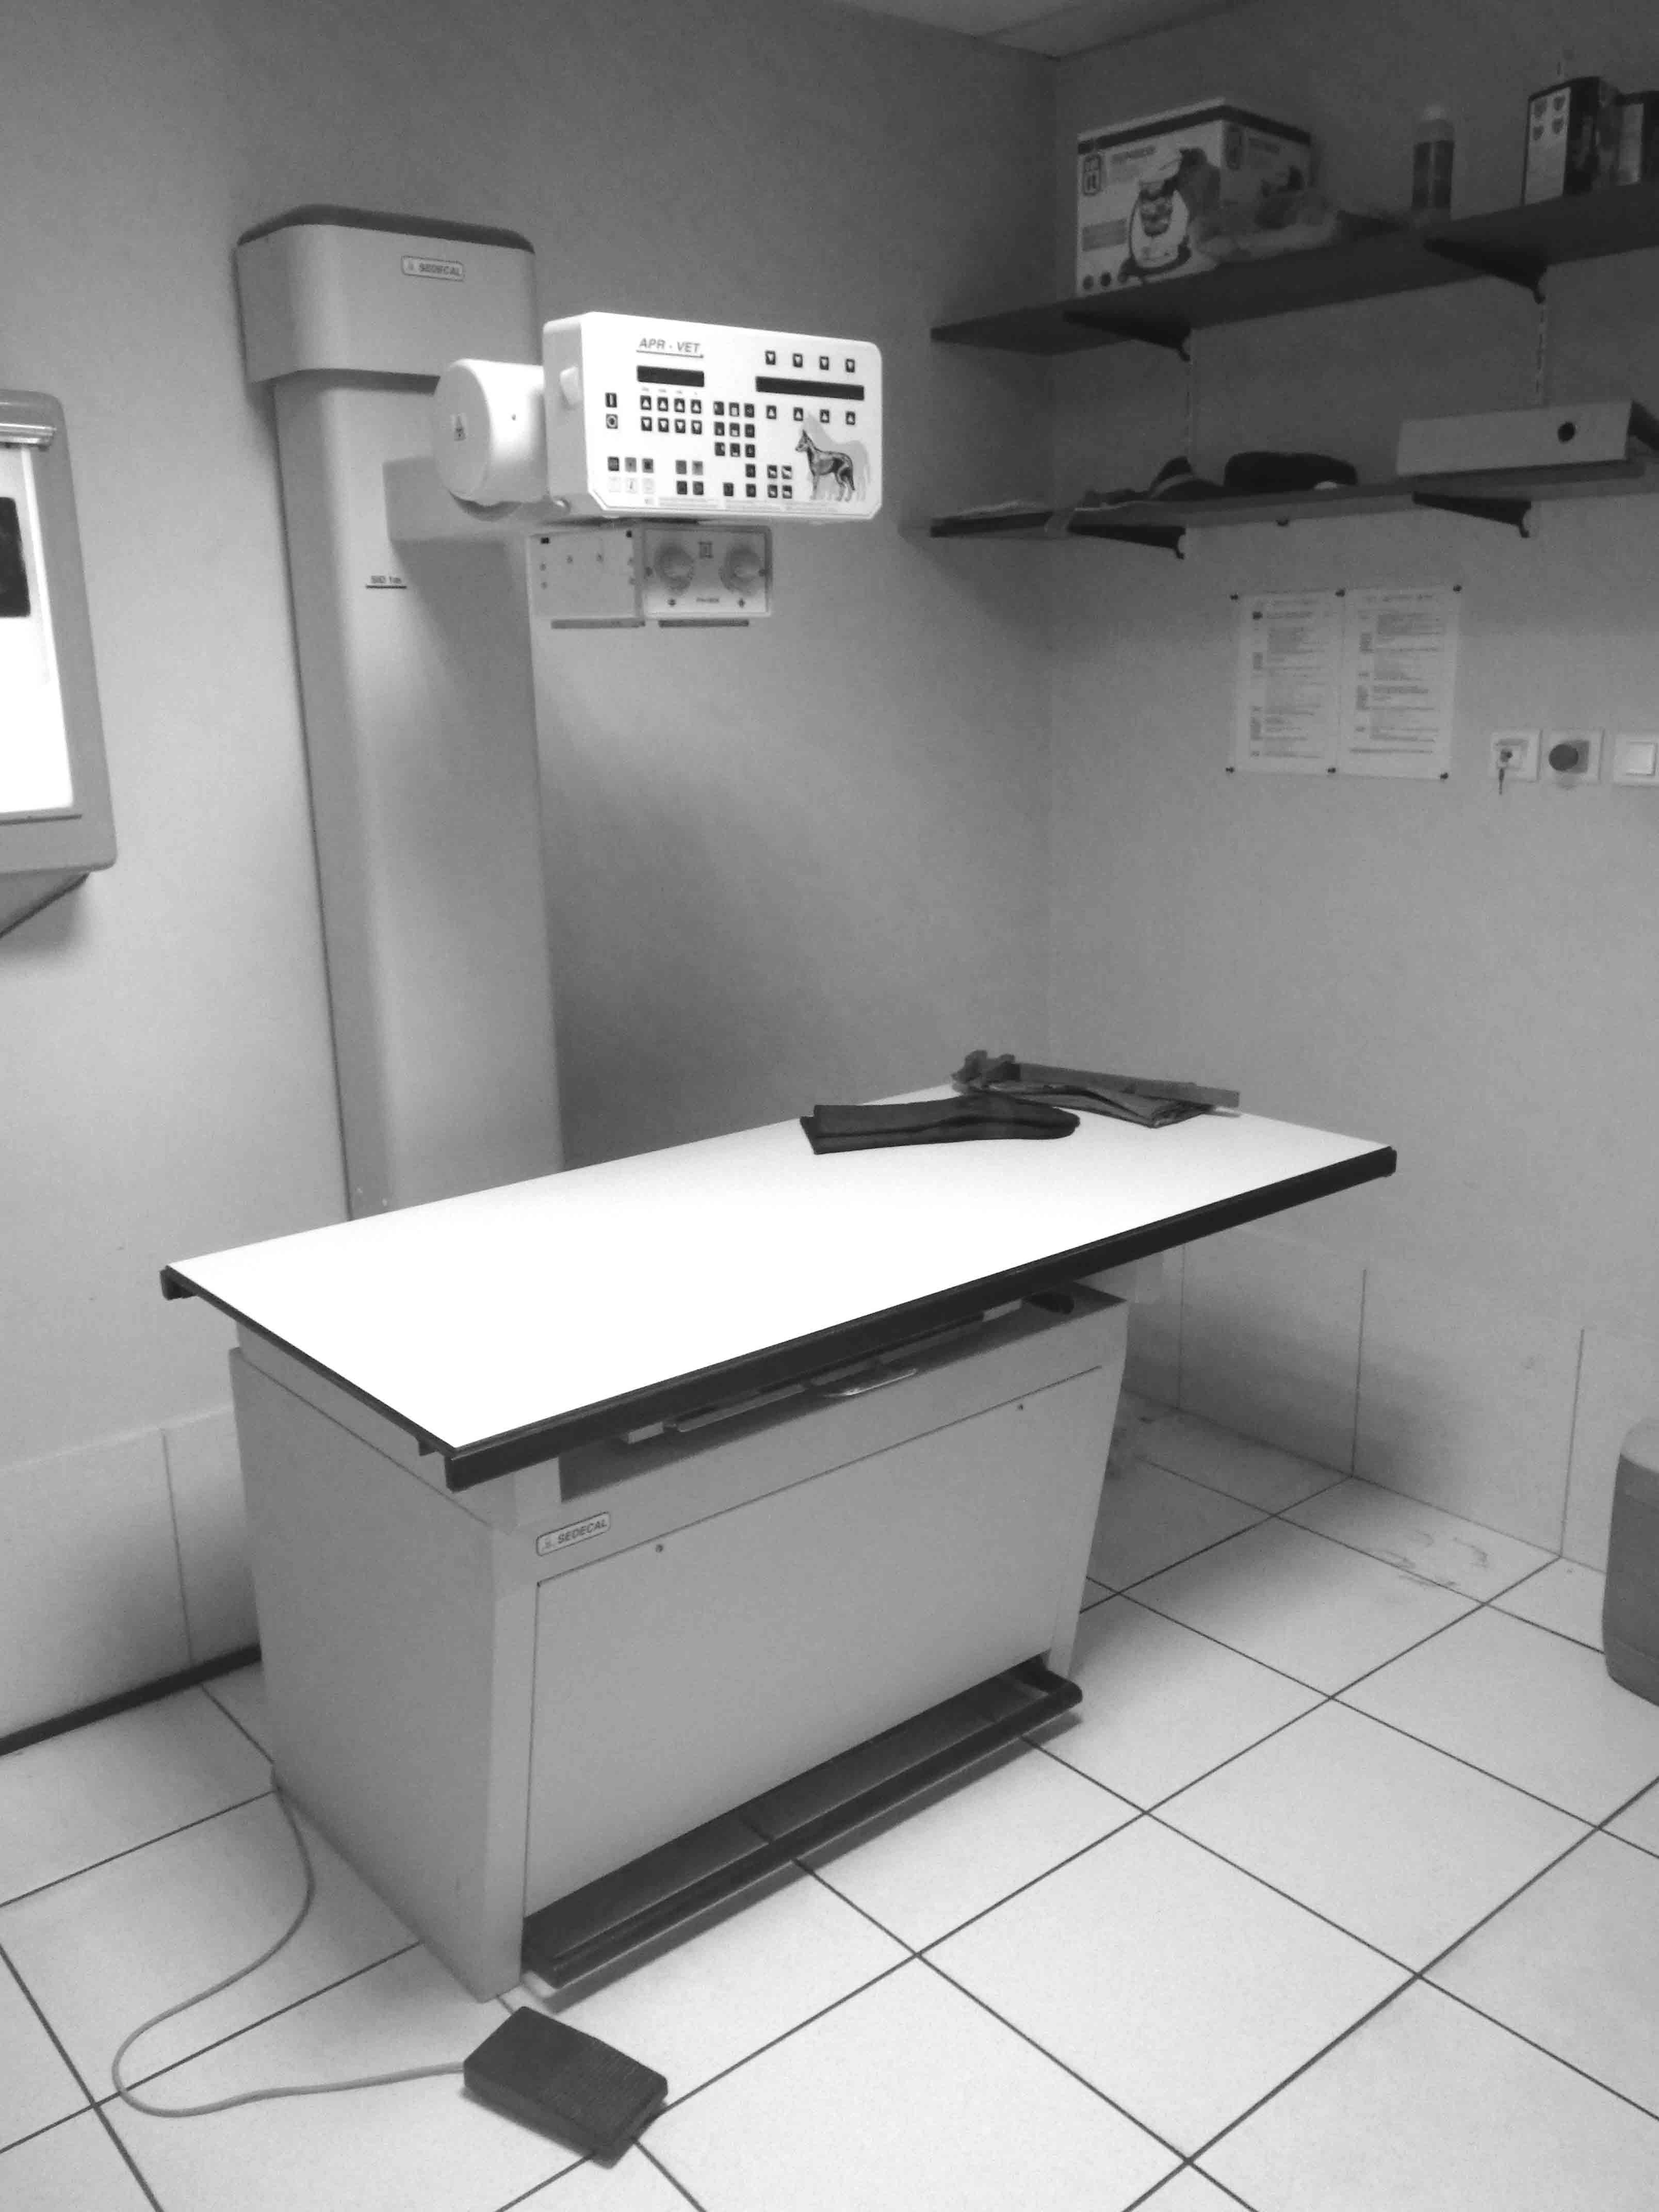 Générateur de rayons X